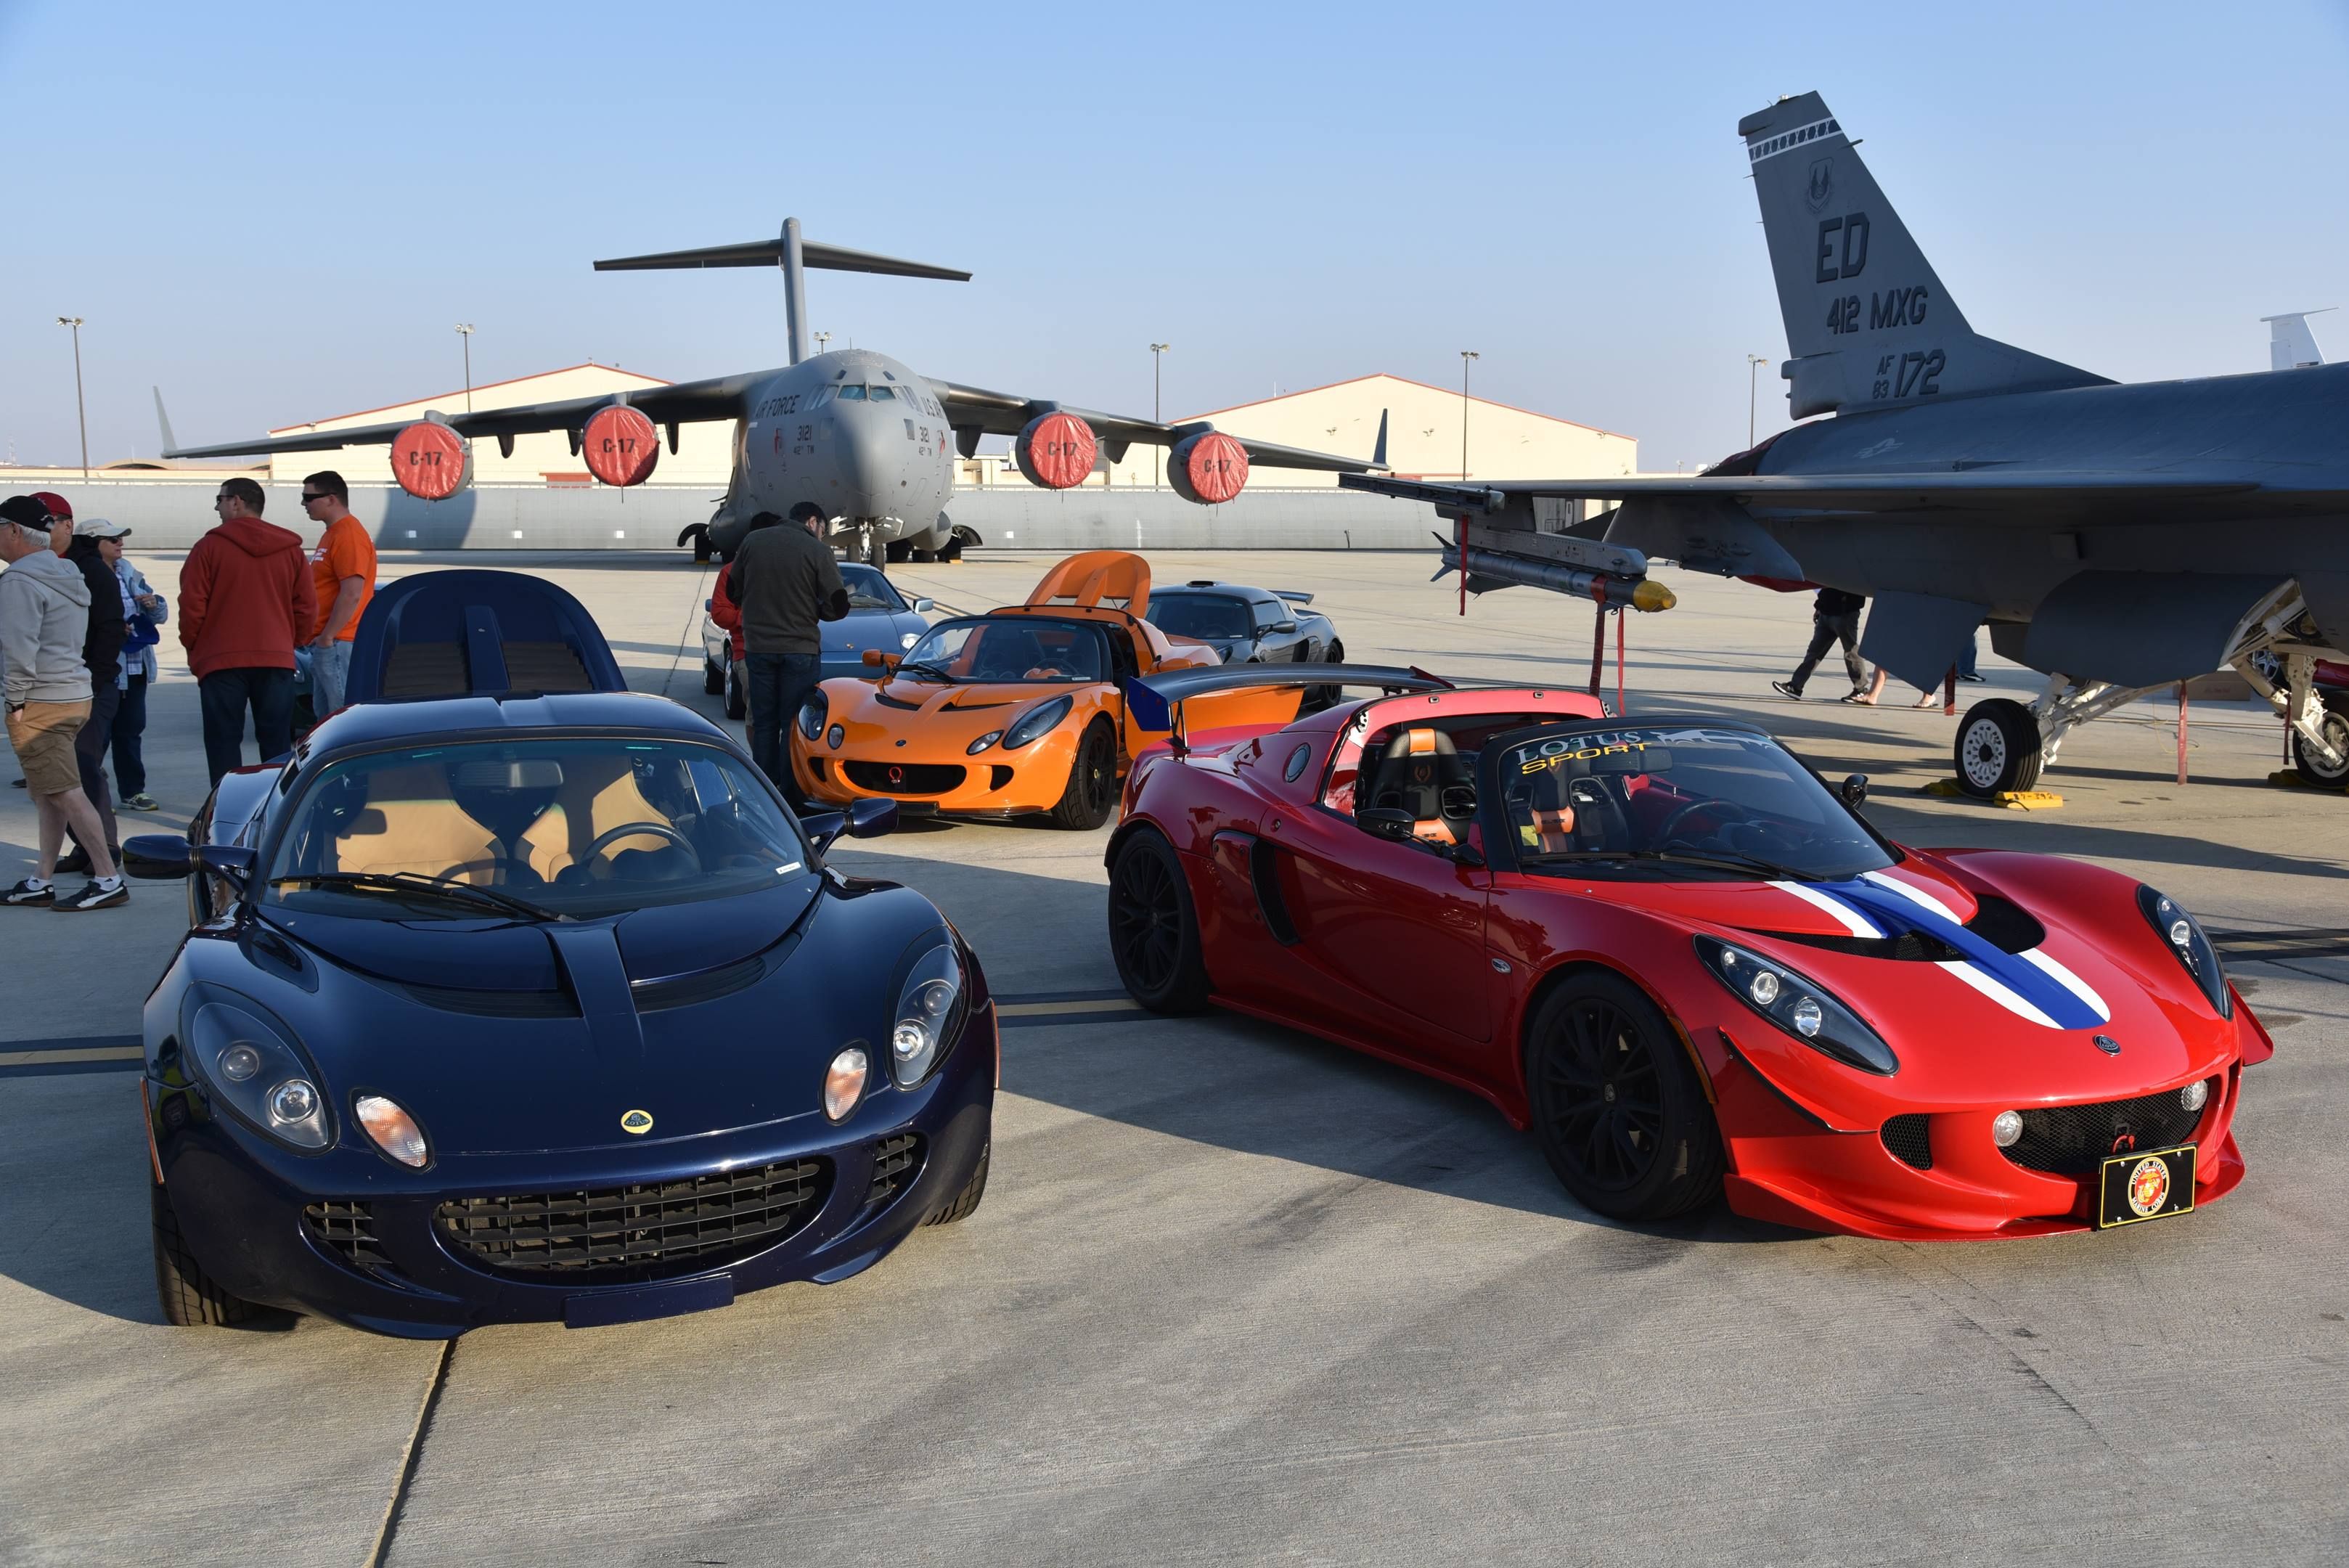 lotus exige edwards air force base